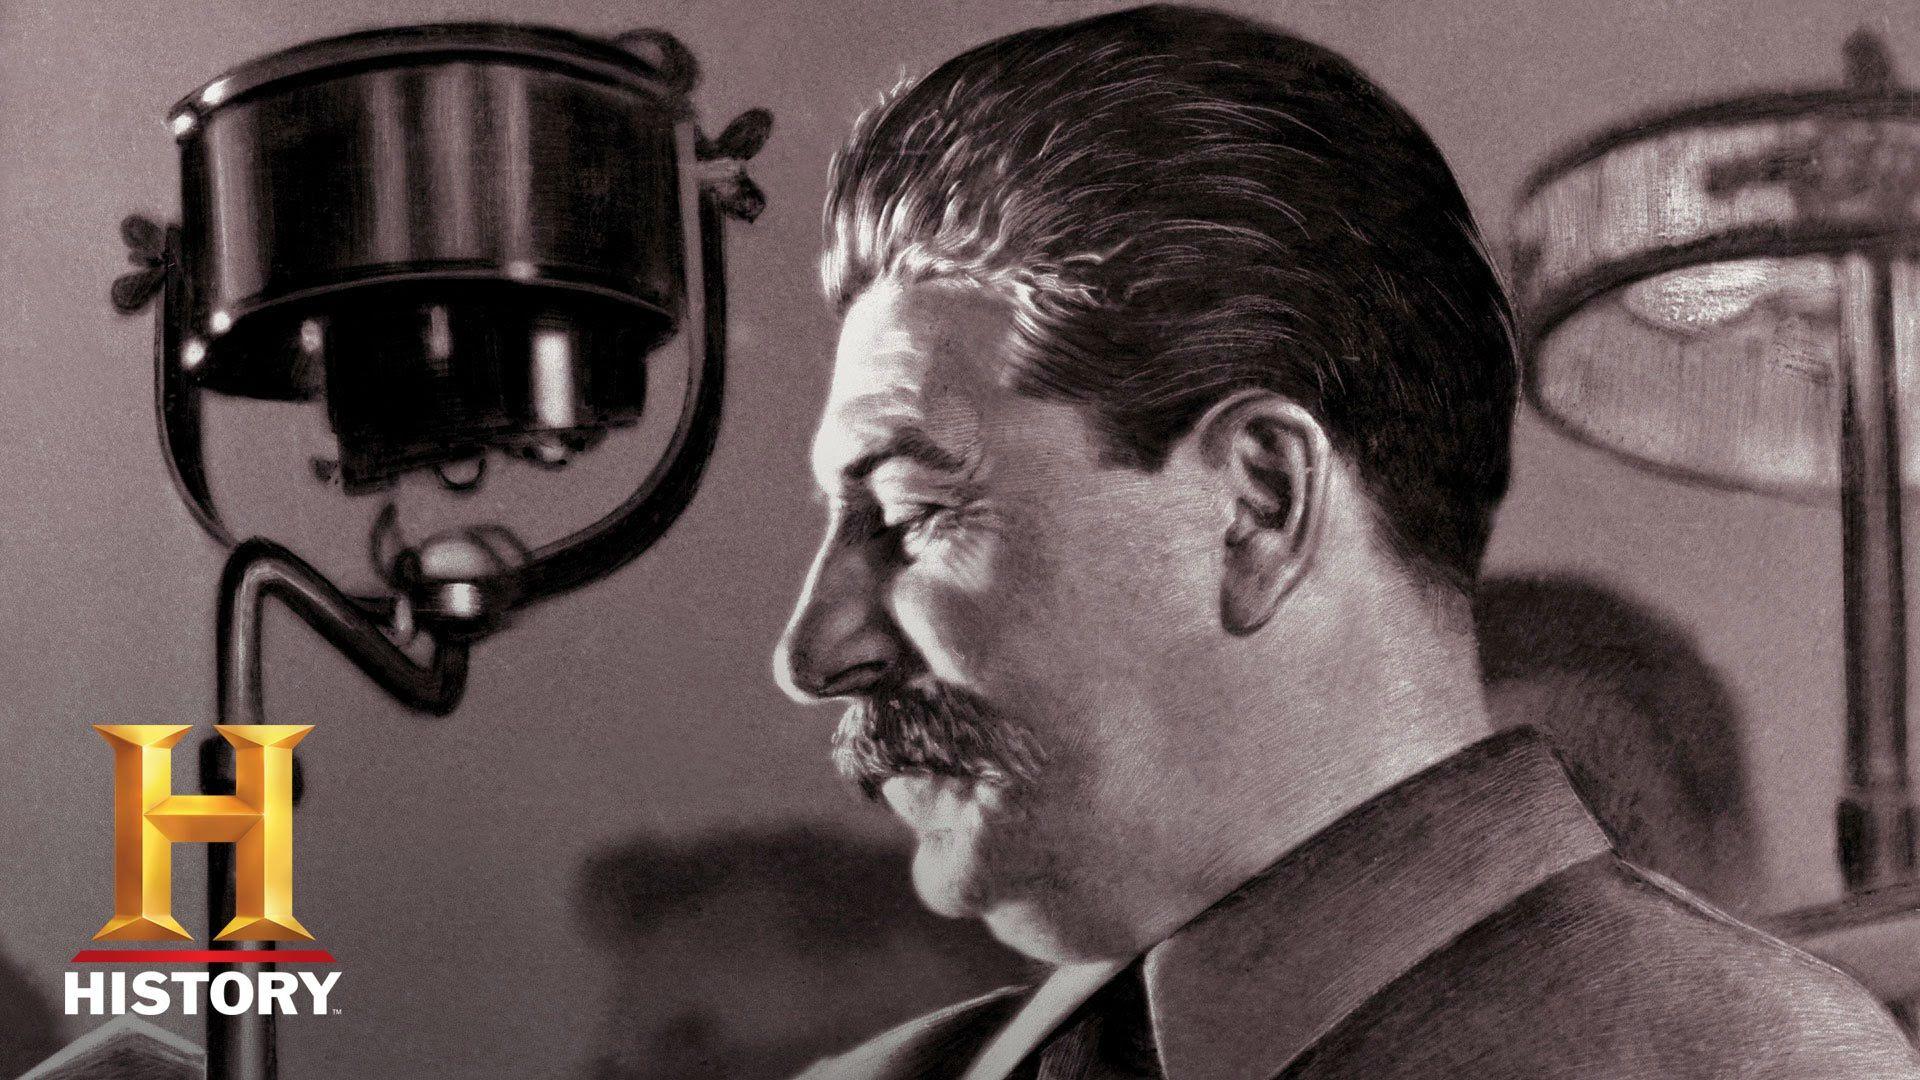 004 Joseph Stalin Created Worst Manmade Famine in History